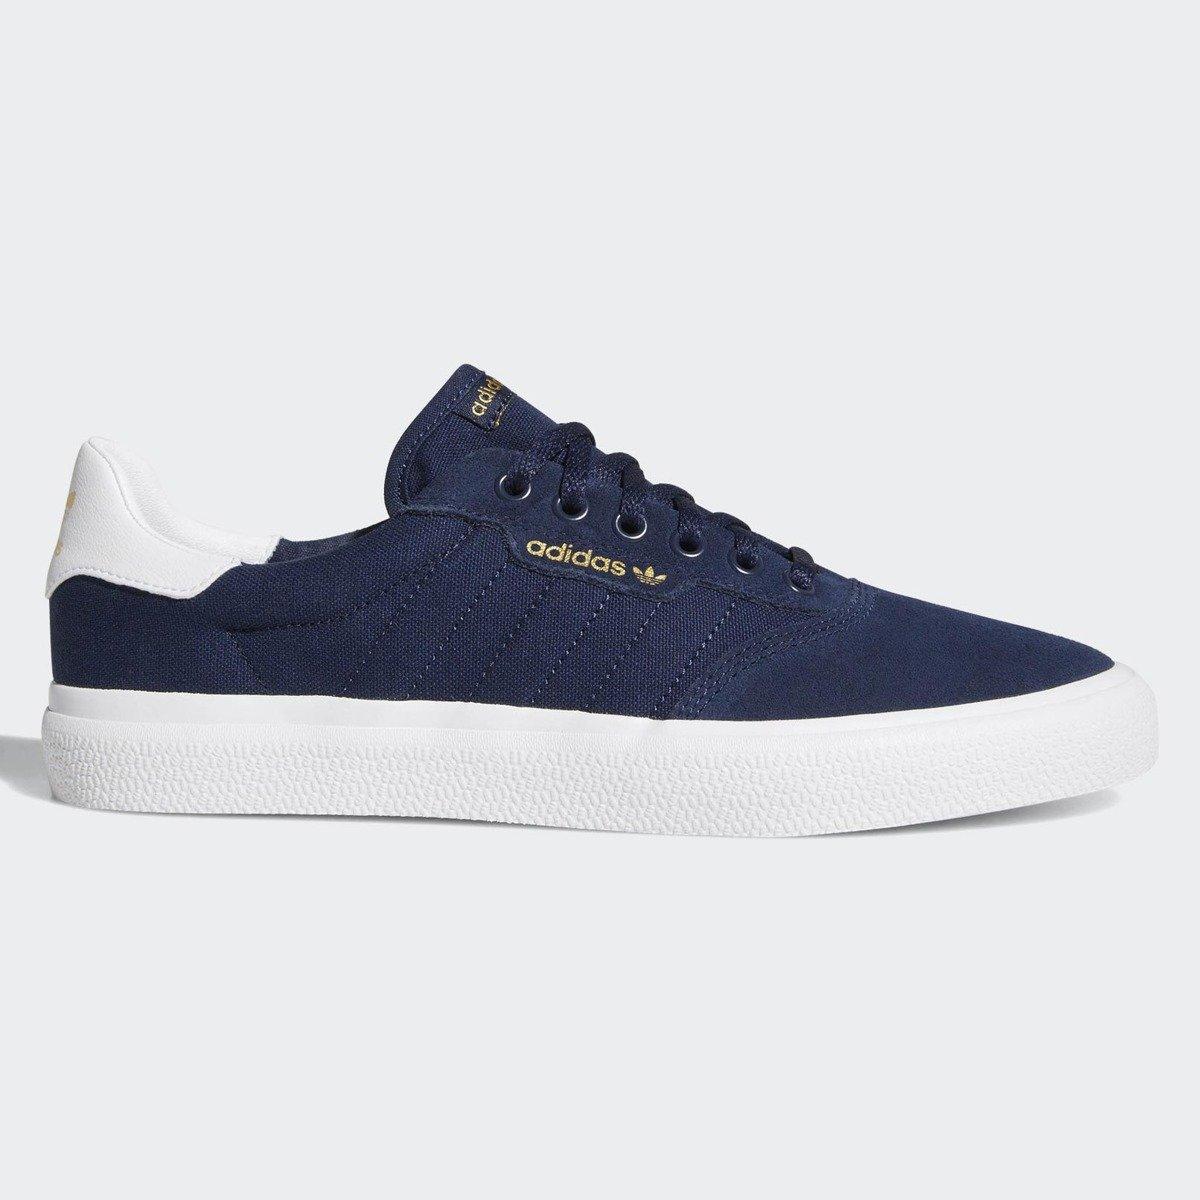 fa1856432b2ba Miniramp Skateshop buty adidas 3mc